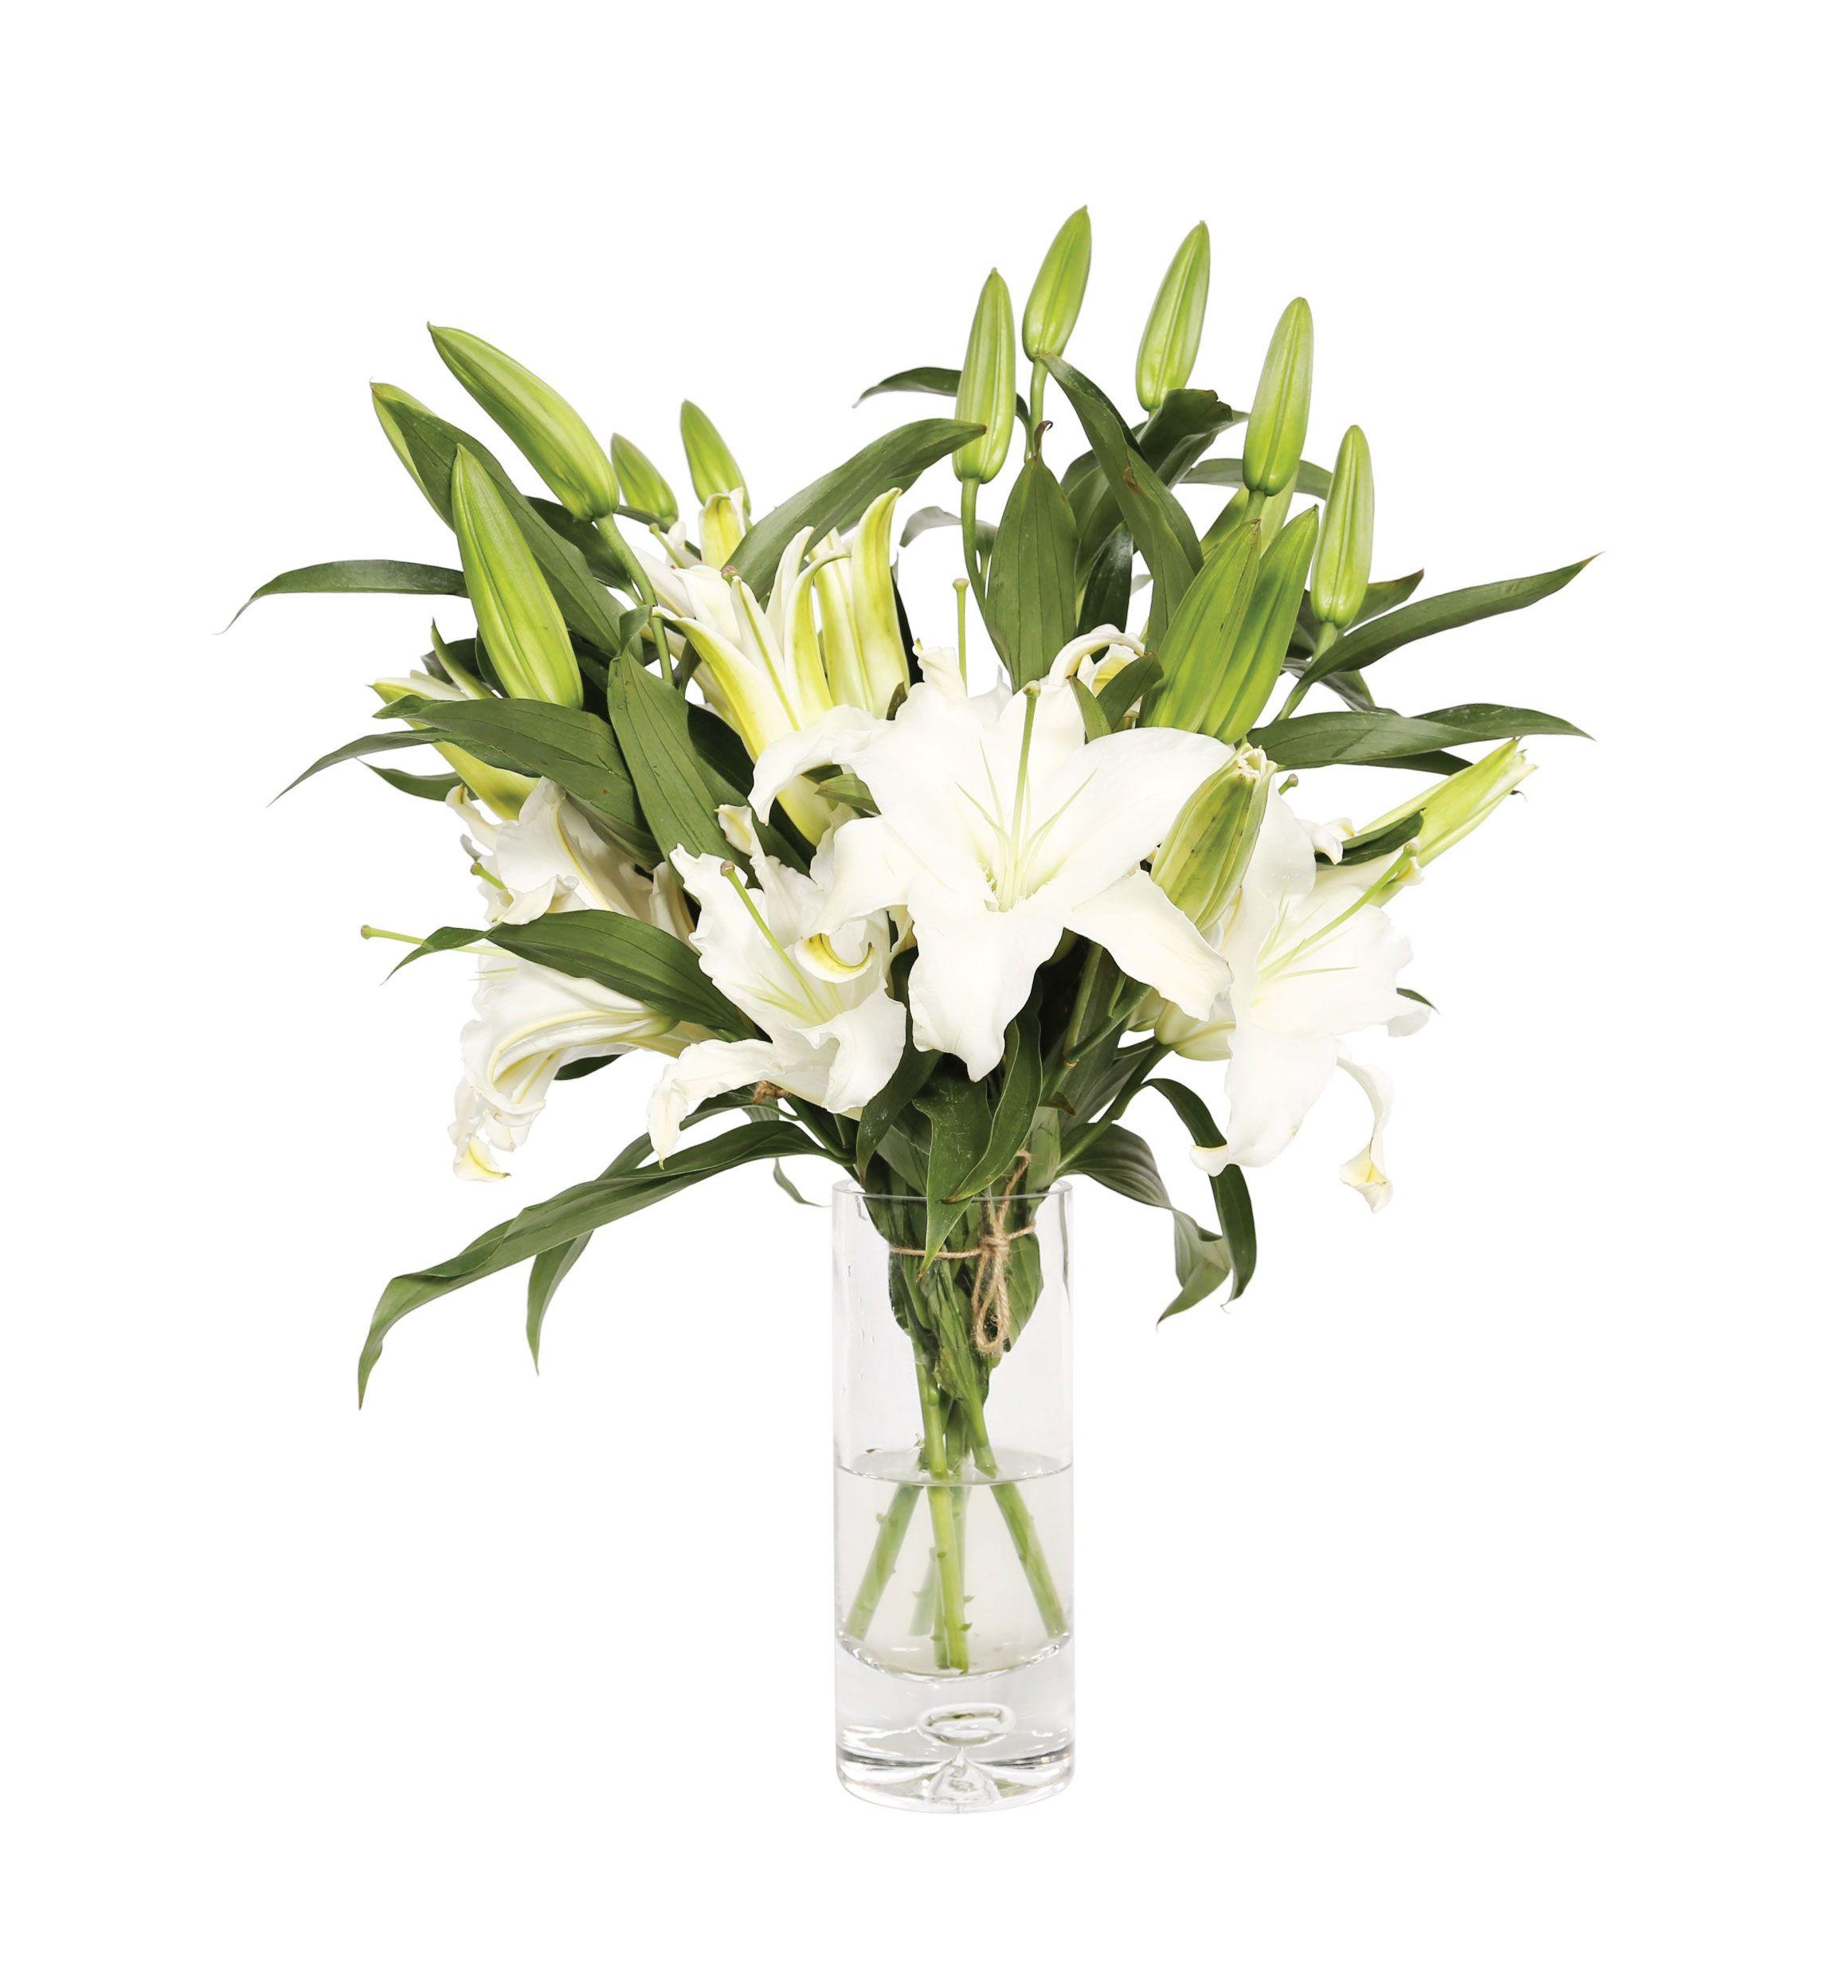 Lilies In Vase Flower Lily Vase Flower Arrangements Vase Flowers